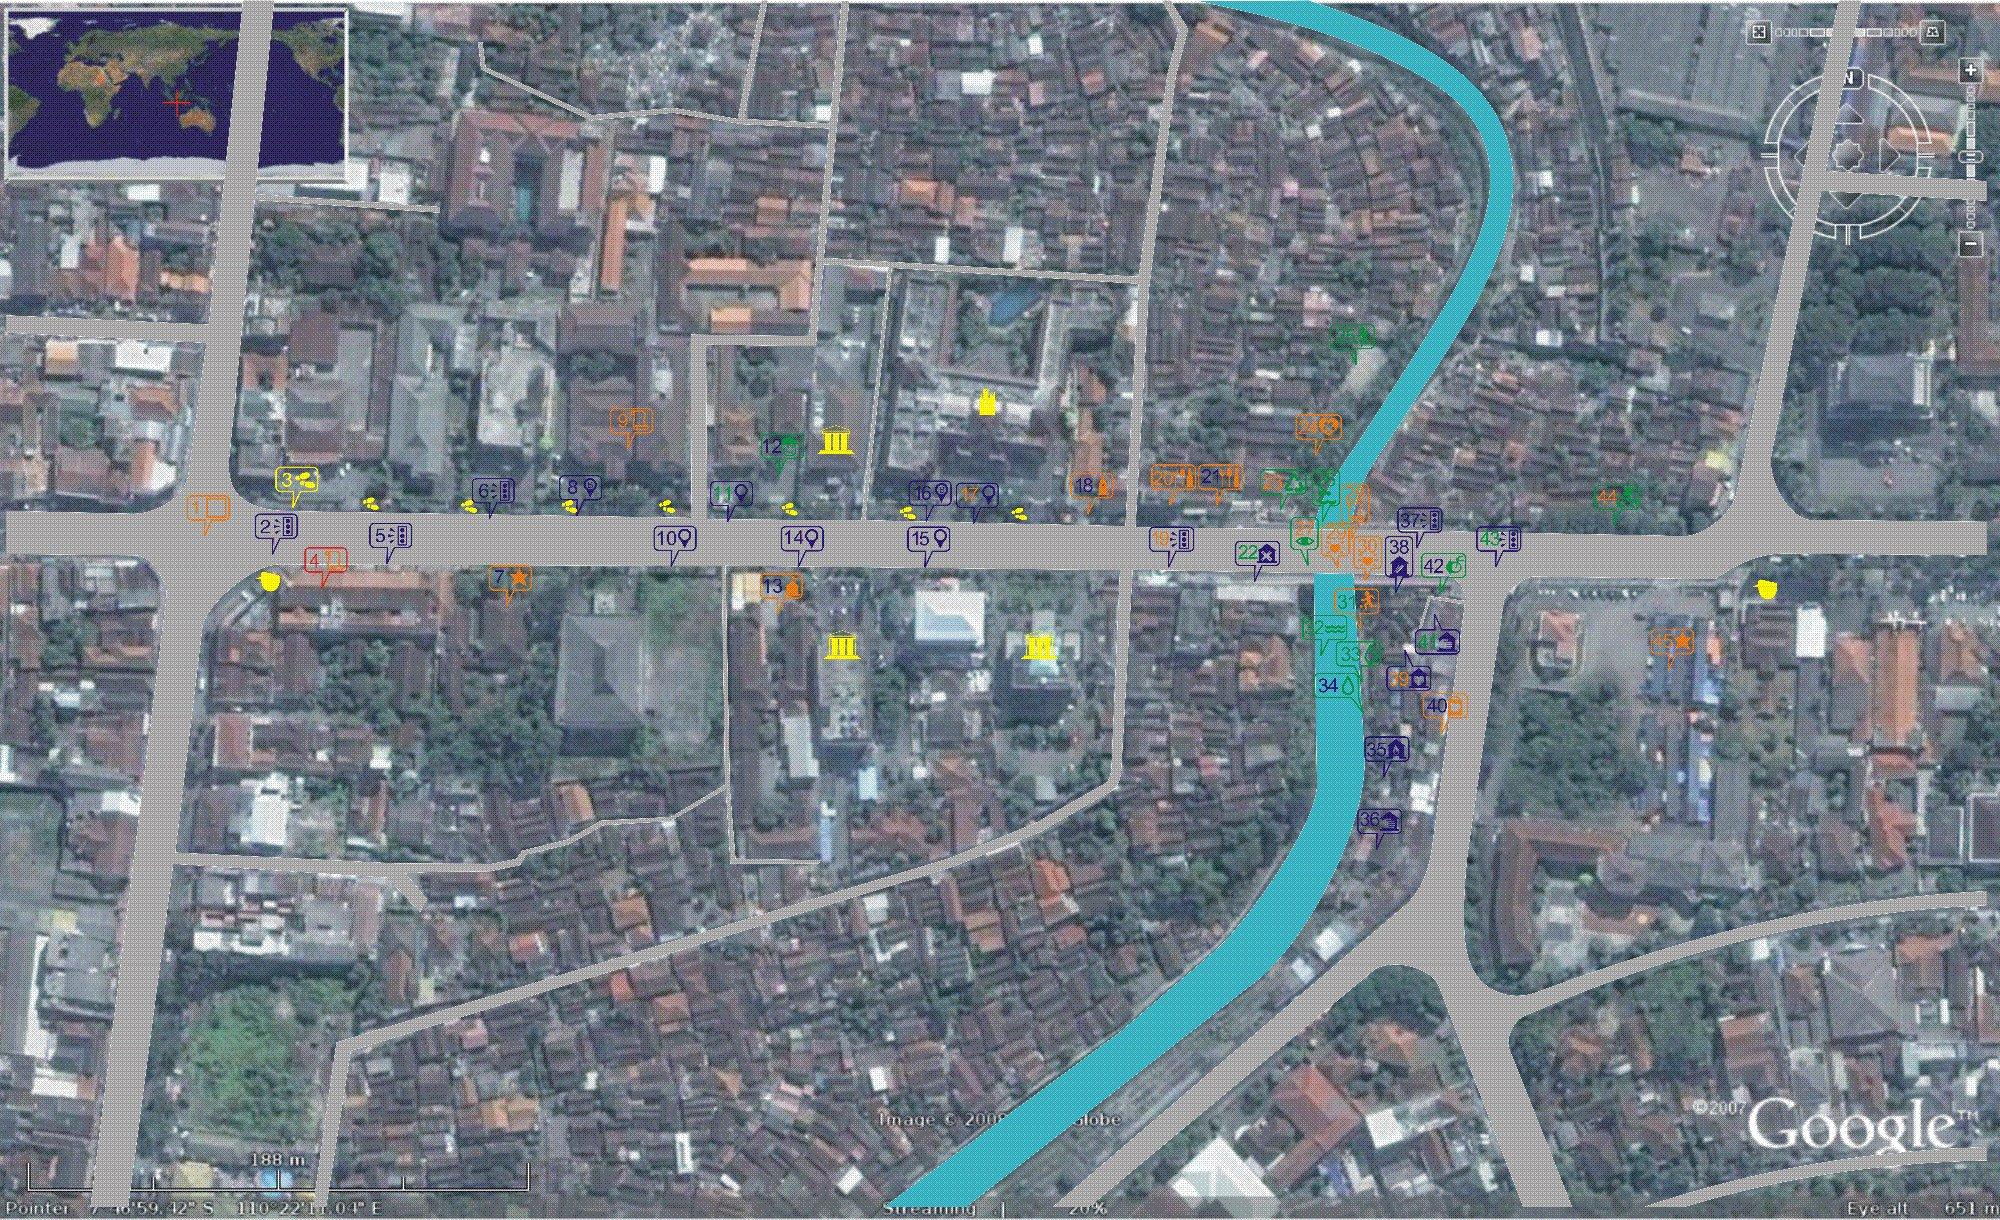 Green Map Code Gondolayu Yogyakarta Green Map System - Yogyakarta map